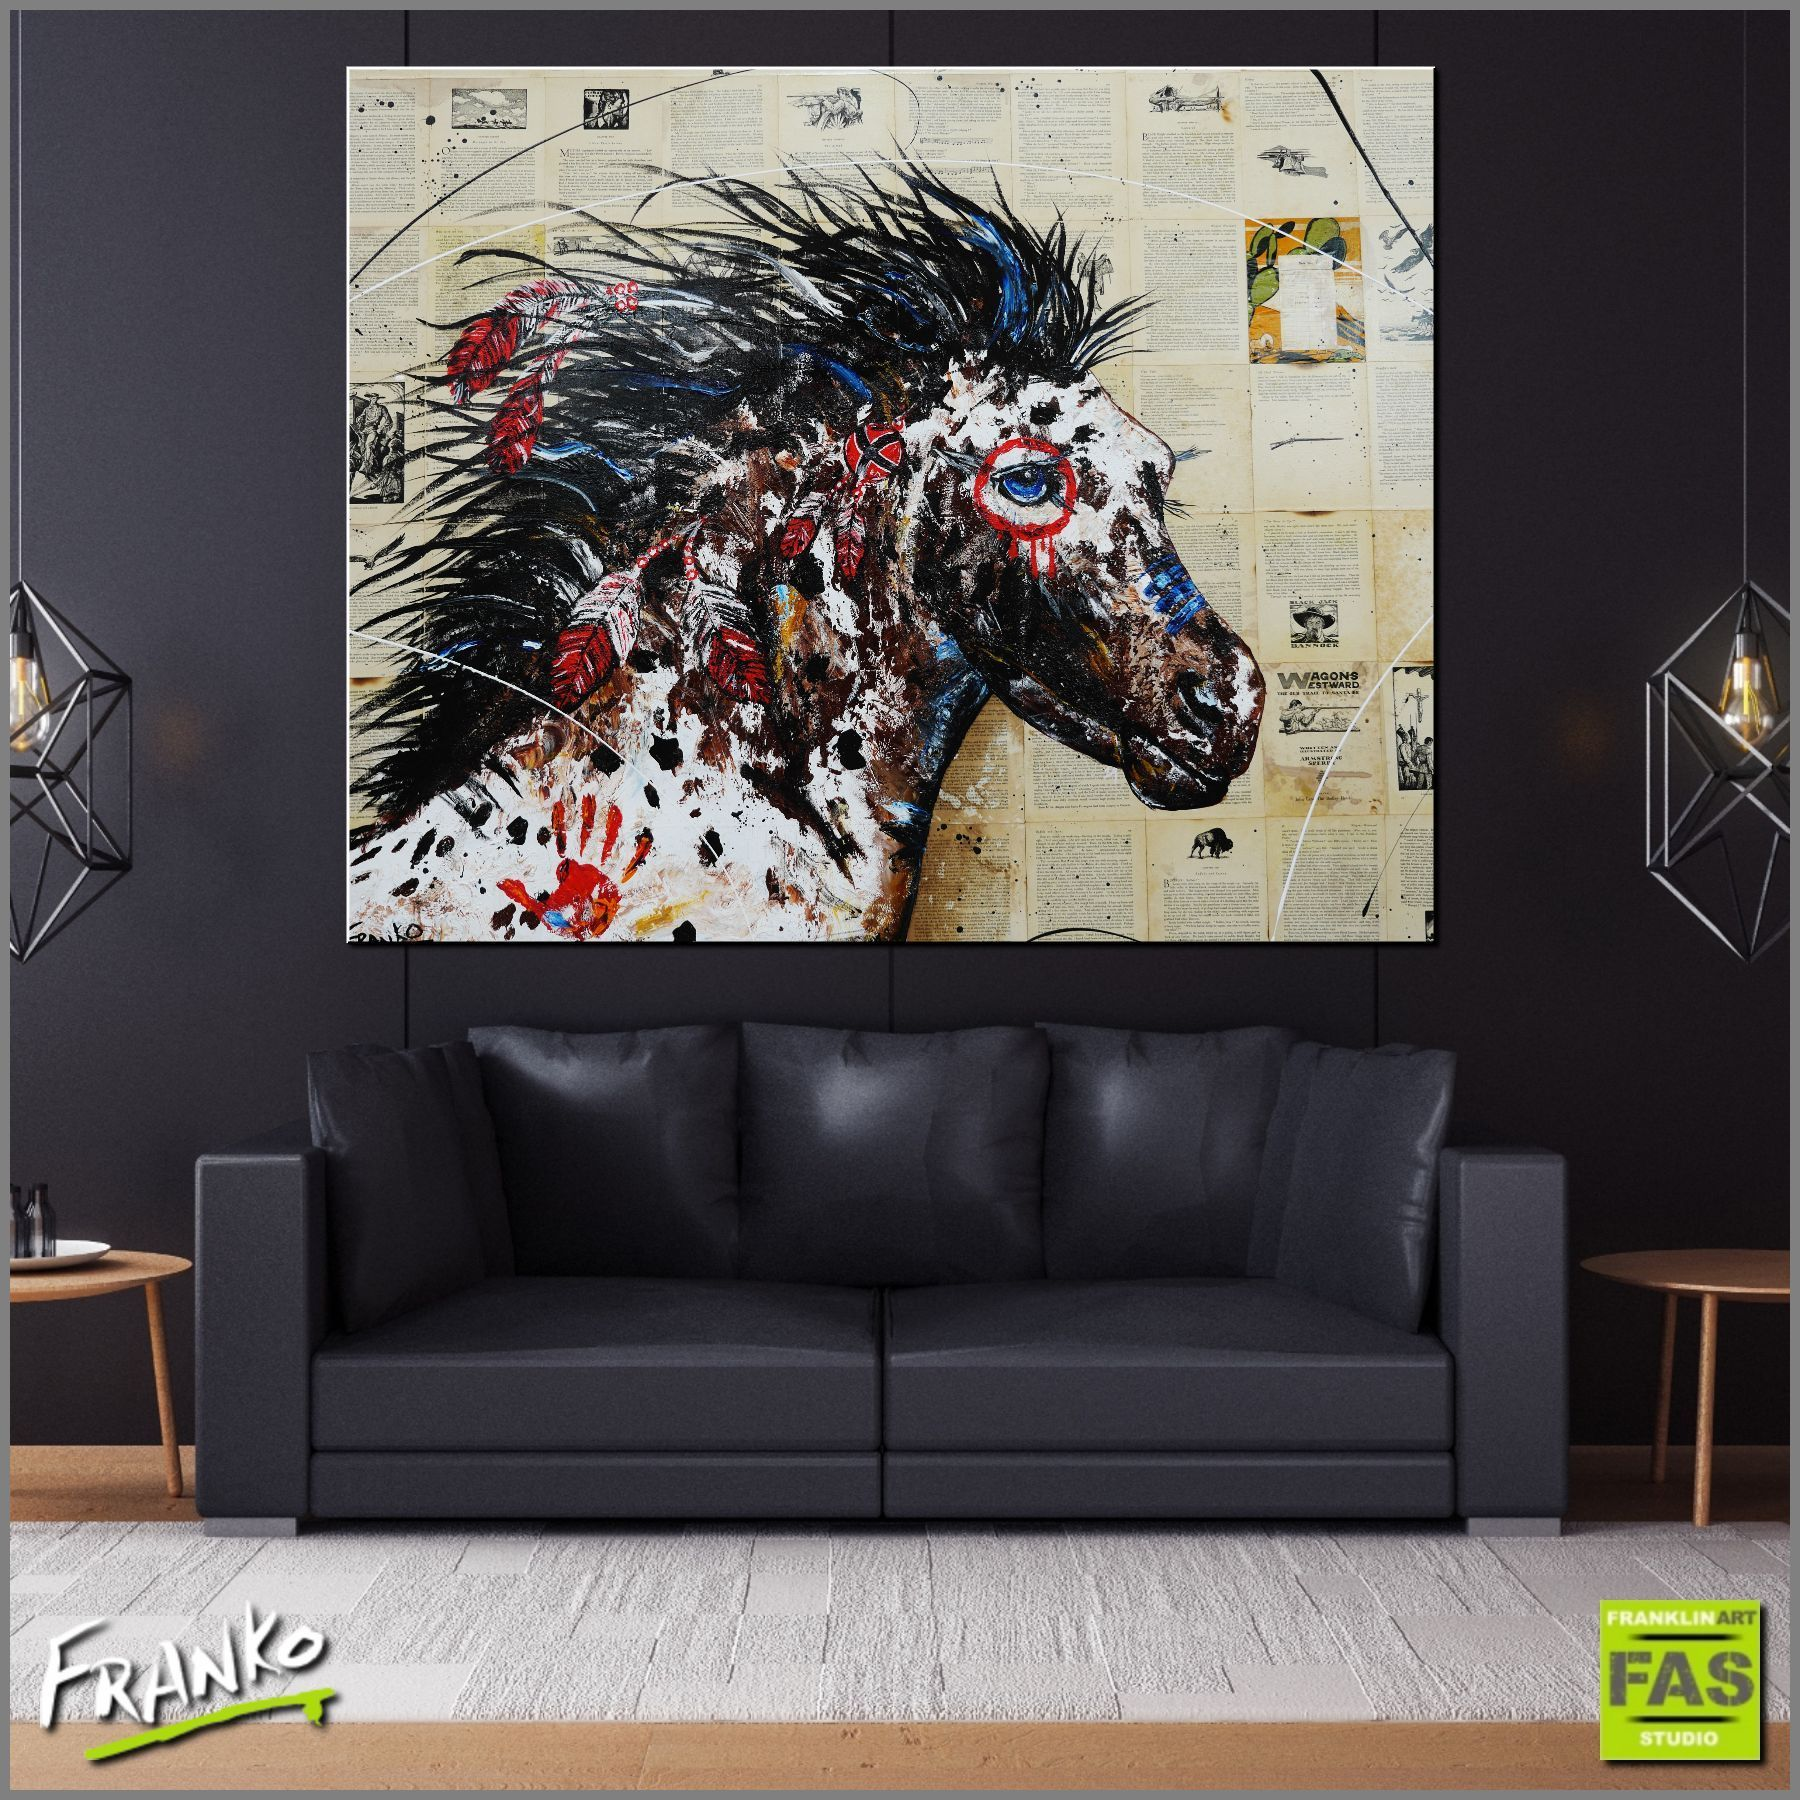 ahiga-war-horse-120cm-x-150cm-indian-war-horse-vintage-book-pop-art-painting-franklin-art-studio-franko-g